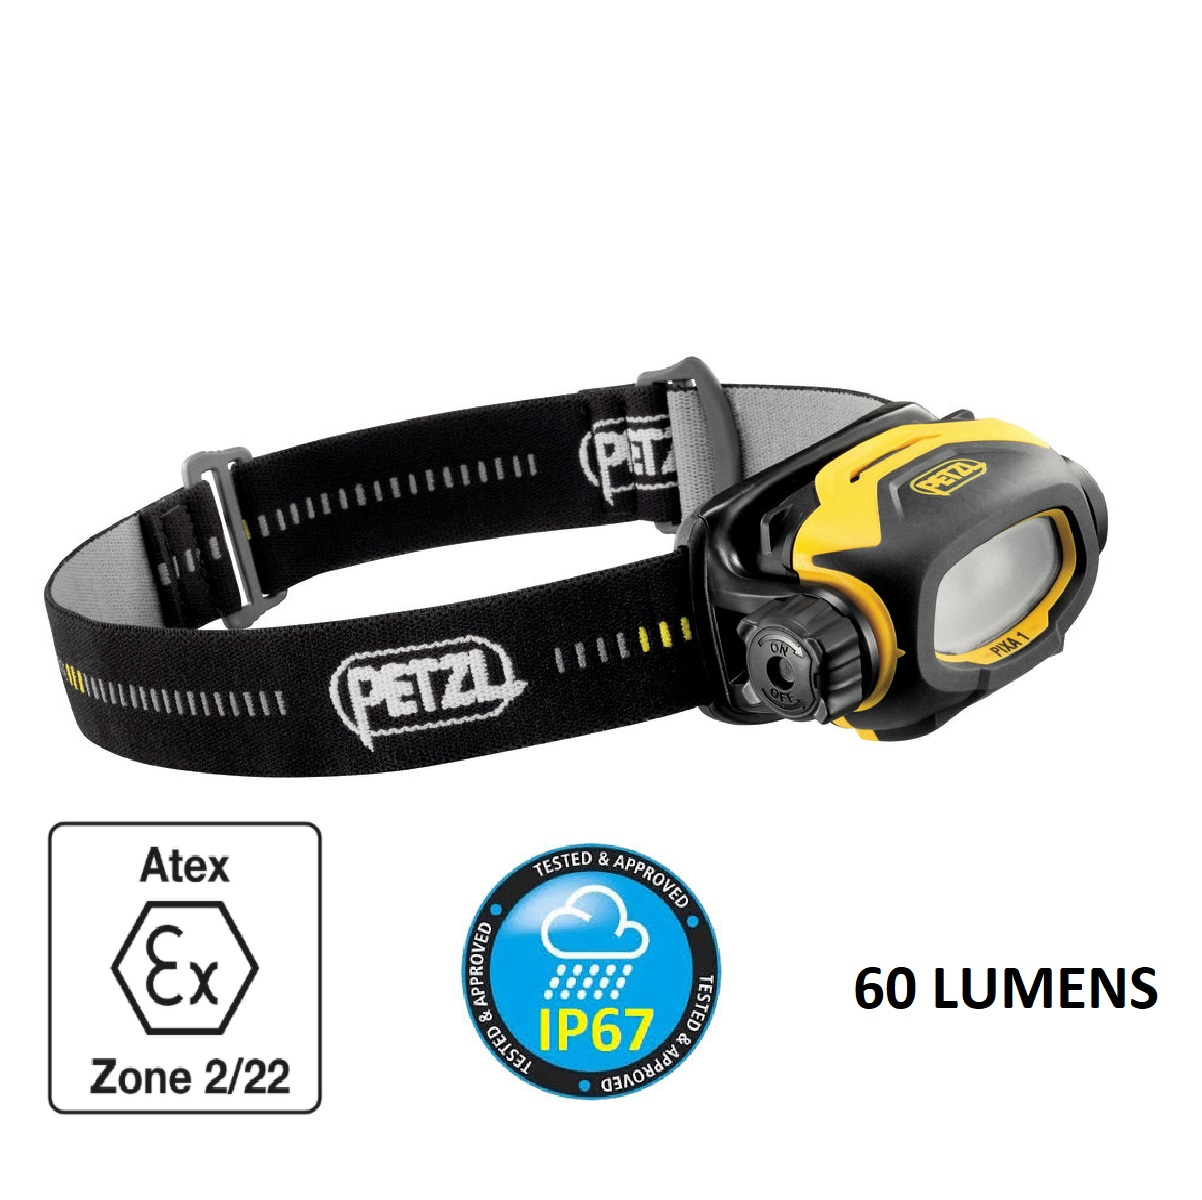 Petzl PIXA® 1 LED 60 Lumens ATEX Hazardous Environment Headlamp 2 X AA Sized Batteries Included